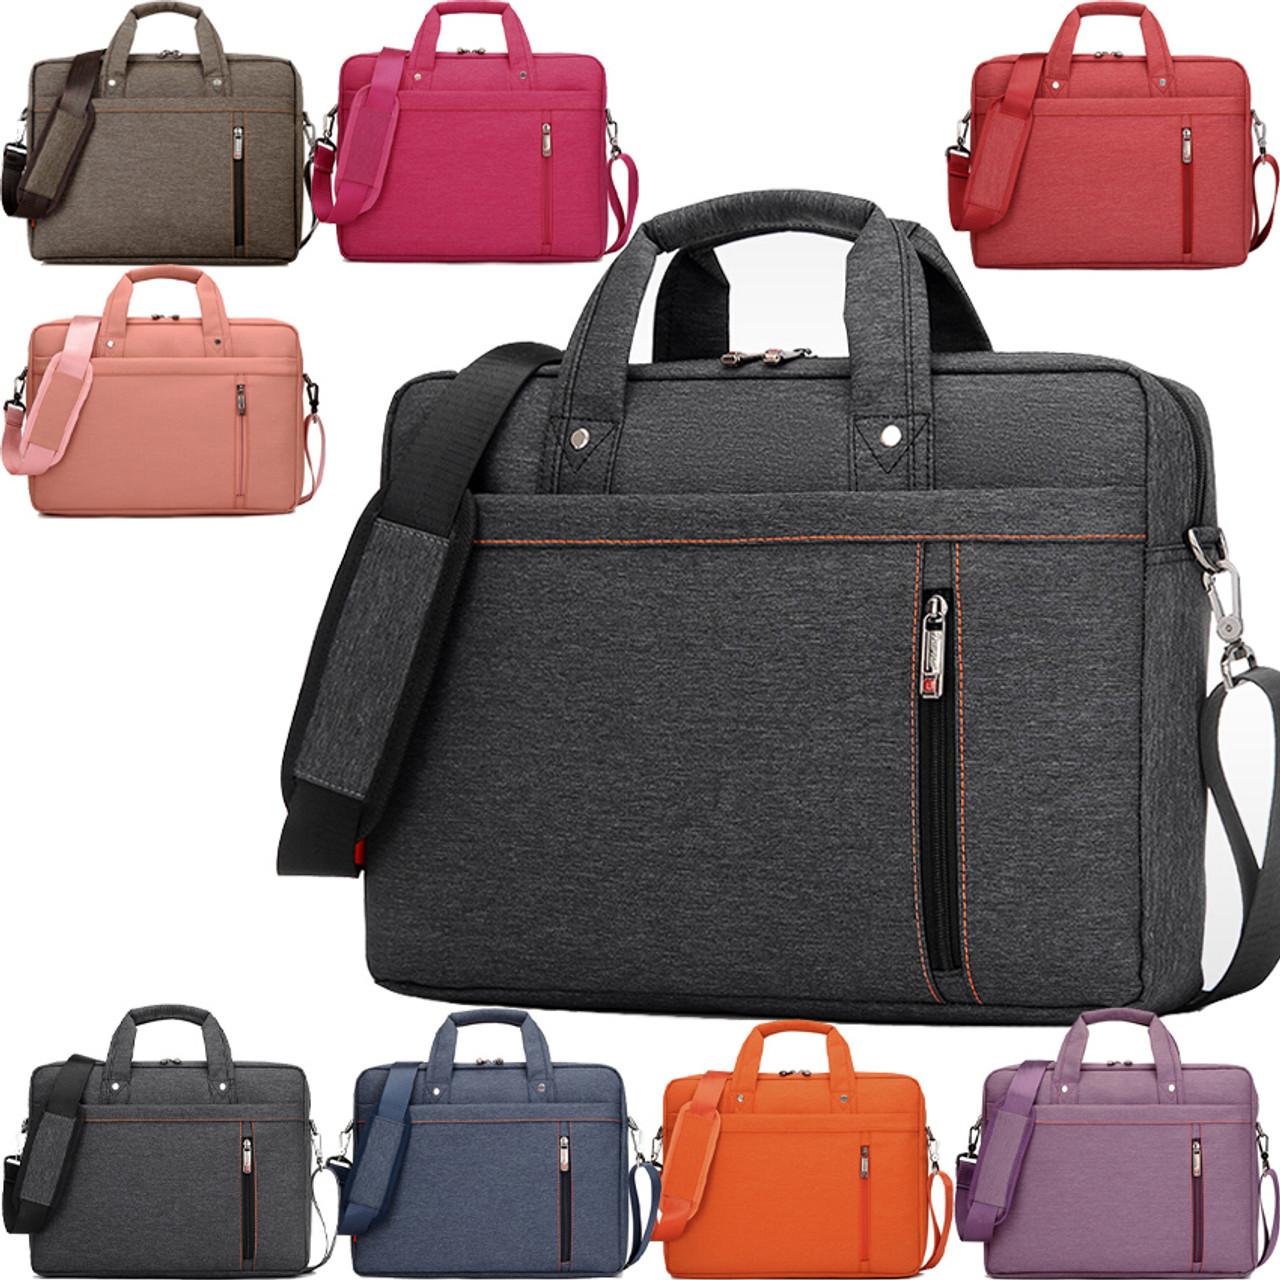 3fa0f10a7e14 Burnur 12 13 14 15 15.6 17 17.3 Inch Waterproof Computer Laptop Notebook  Tablet Bag Bags Case Messenger Shoulder for Men Women